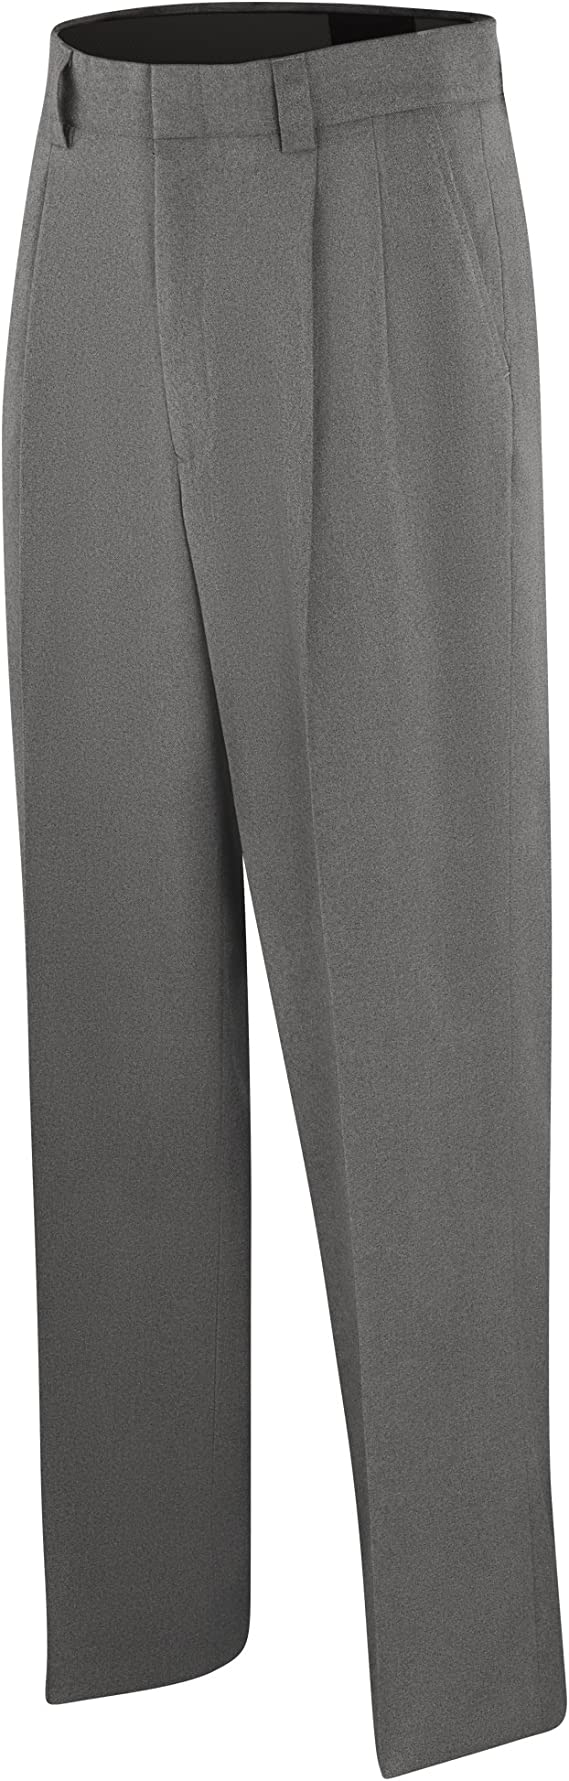 Size 44 Schutt Sports Heather Grey Adams USA ADMBB371-44-HG Umpire Combo Pleated Poly//Spandex Uniform Pants